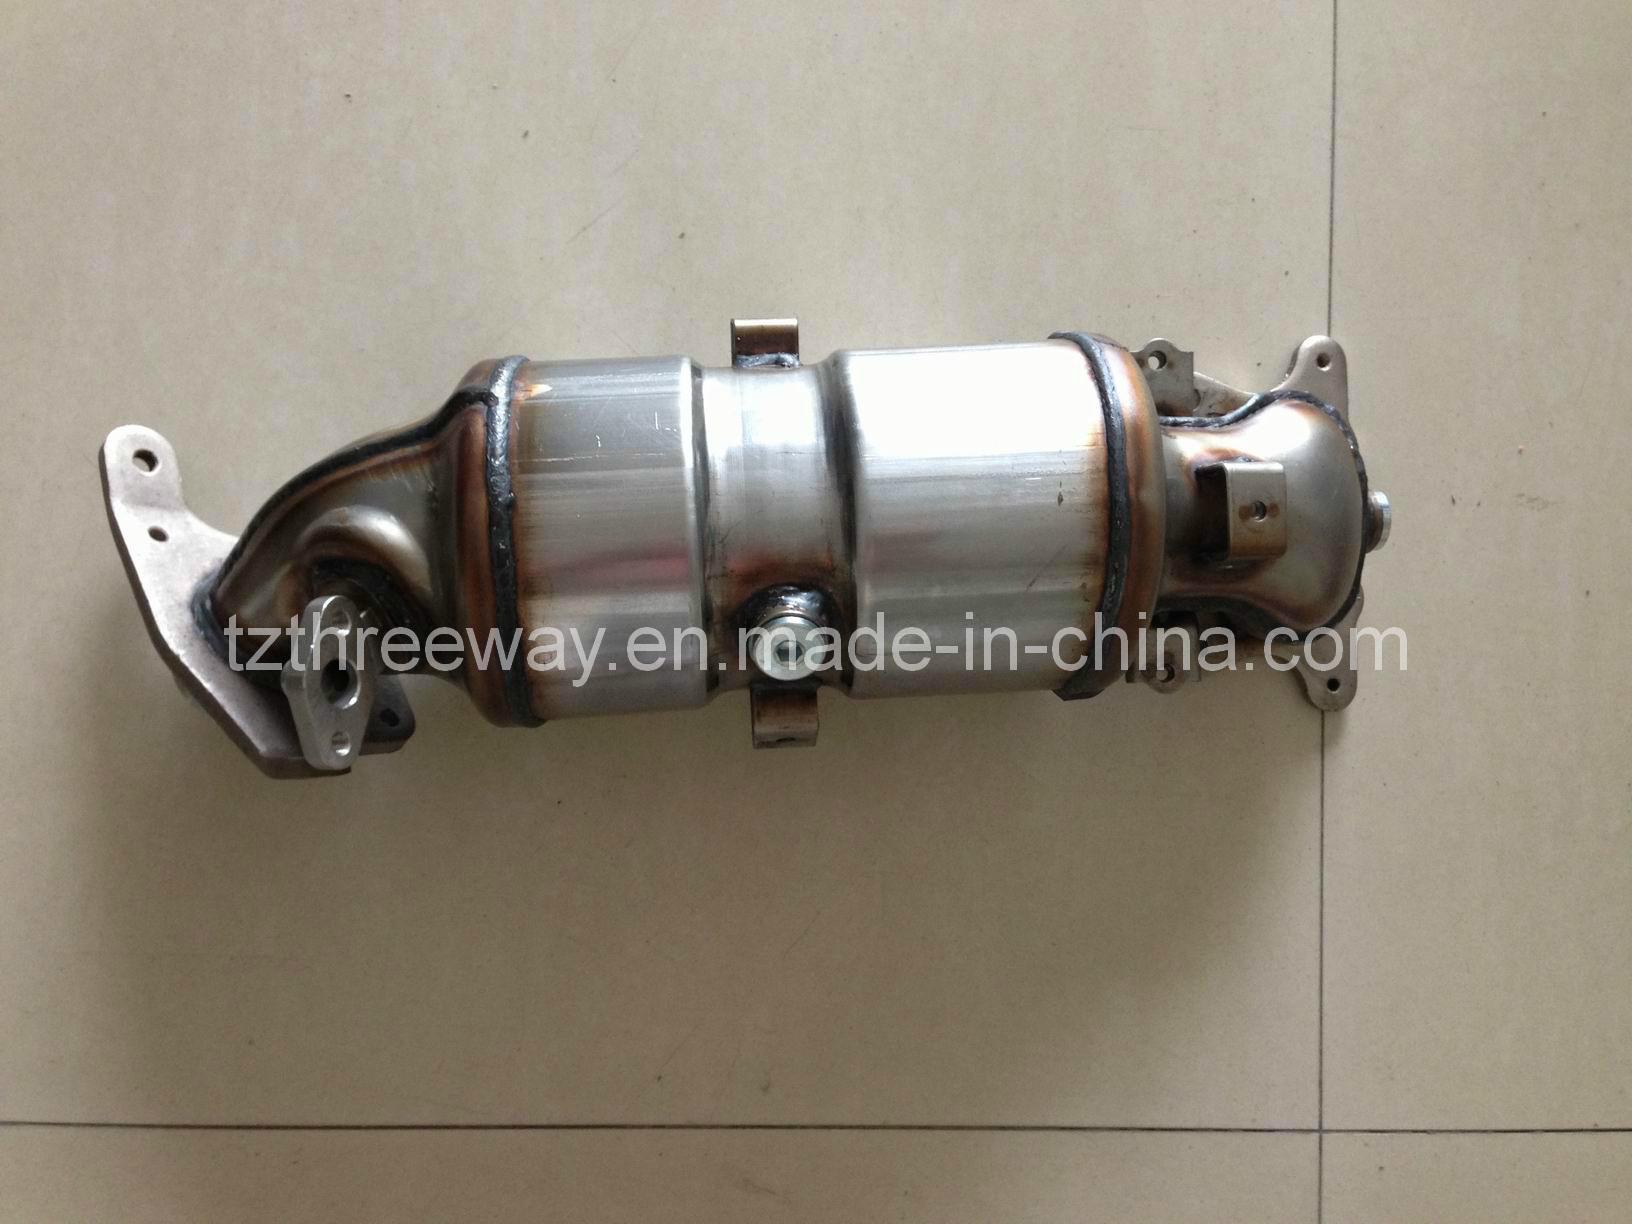 Direct-Fit Catalytic Converter Suitable for Honda Civic Emission Euro4 OBD